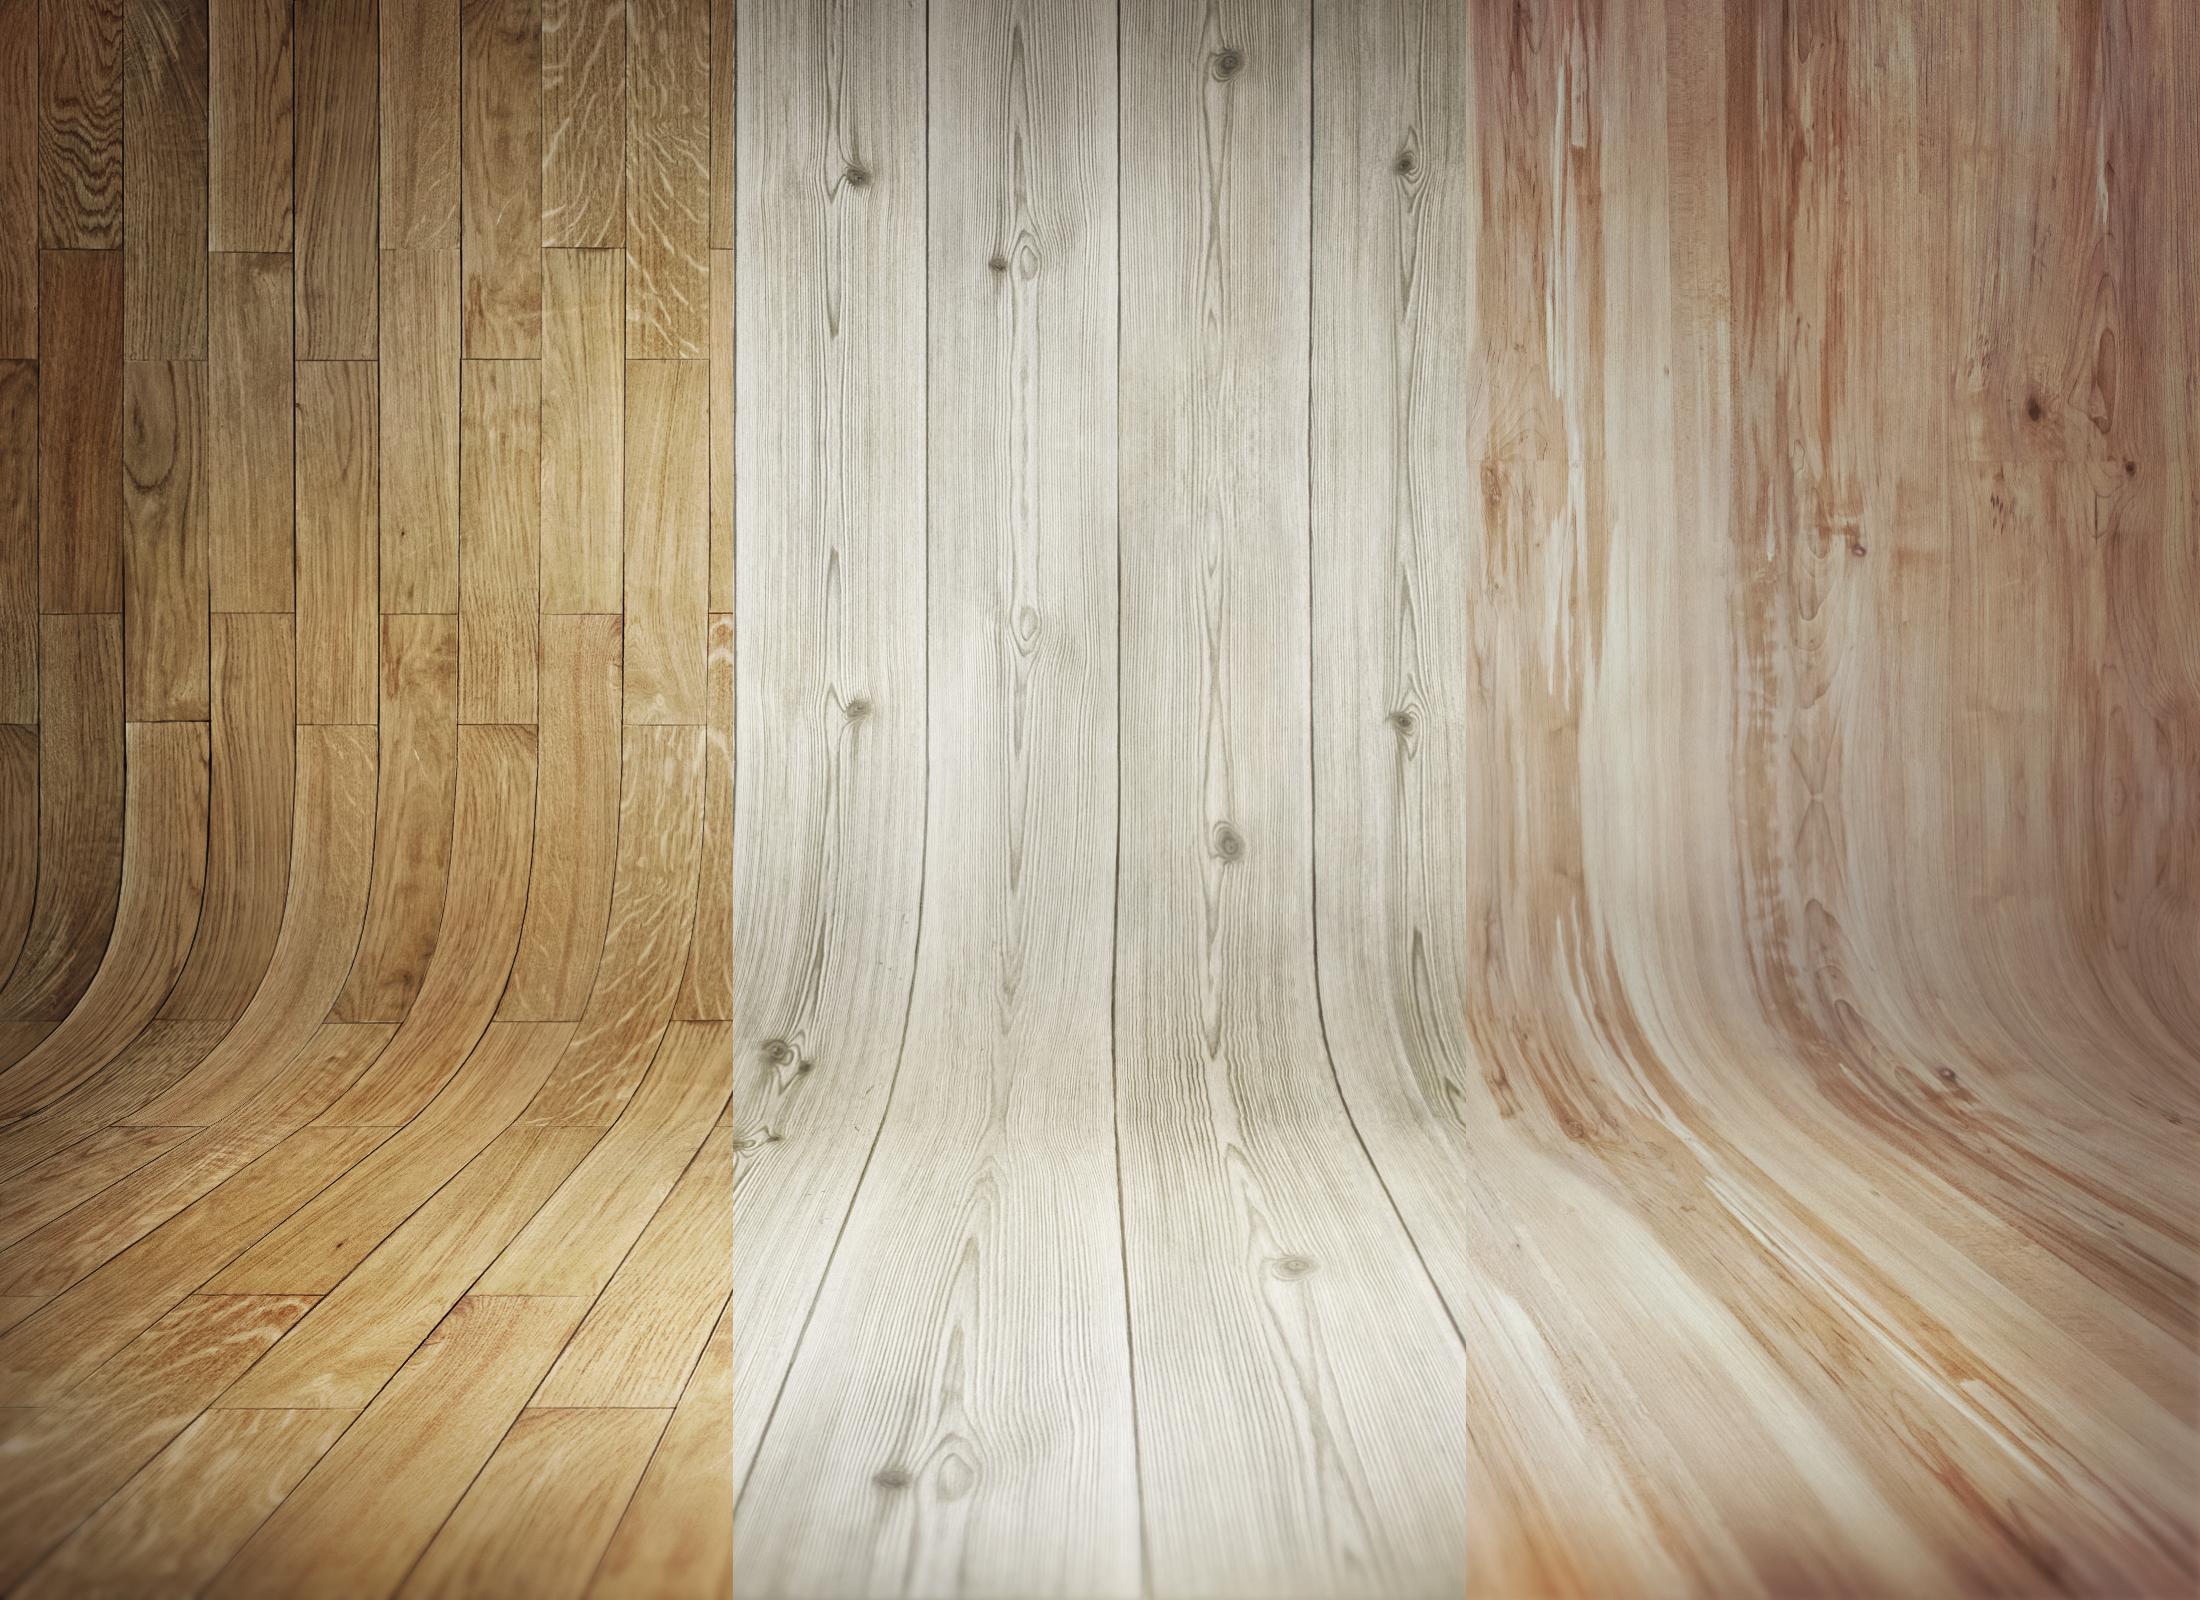 Download Wallpaper Keren 3d 3 Curved Wooden Backdrops Vol 1 Graphicburger